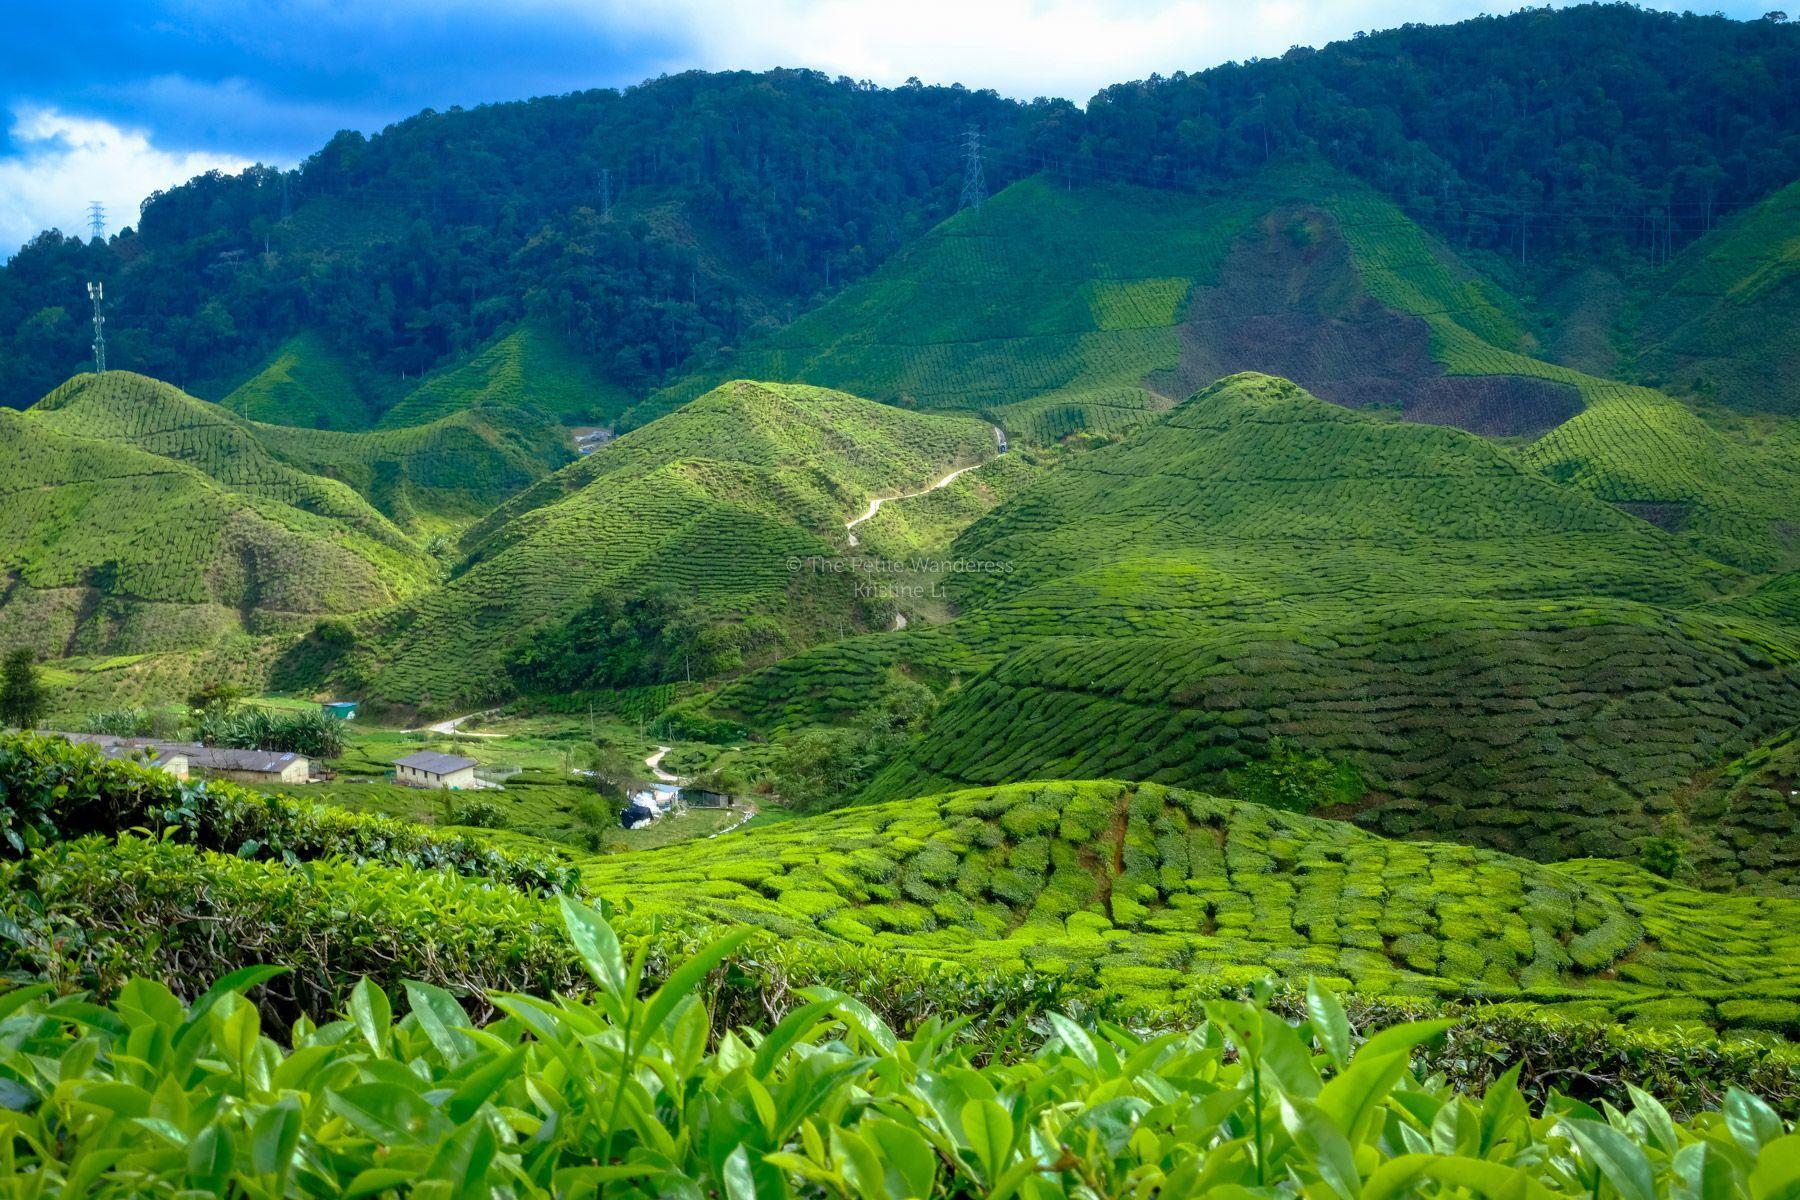 مرتفعات الكاميرون في ماليزيا الجنة الخضراء Cameron Highlands Cool Places To Visit Thailand Tourism